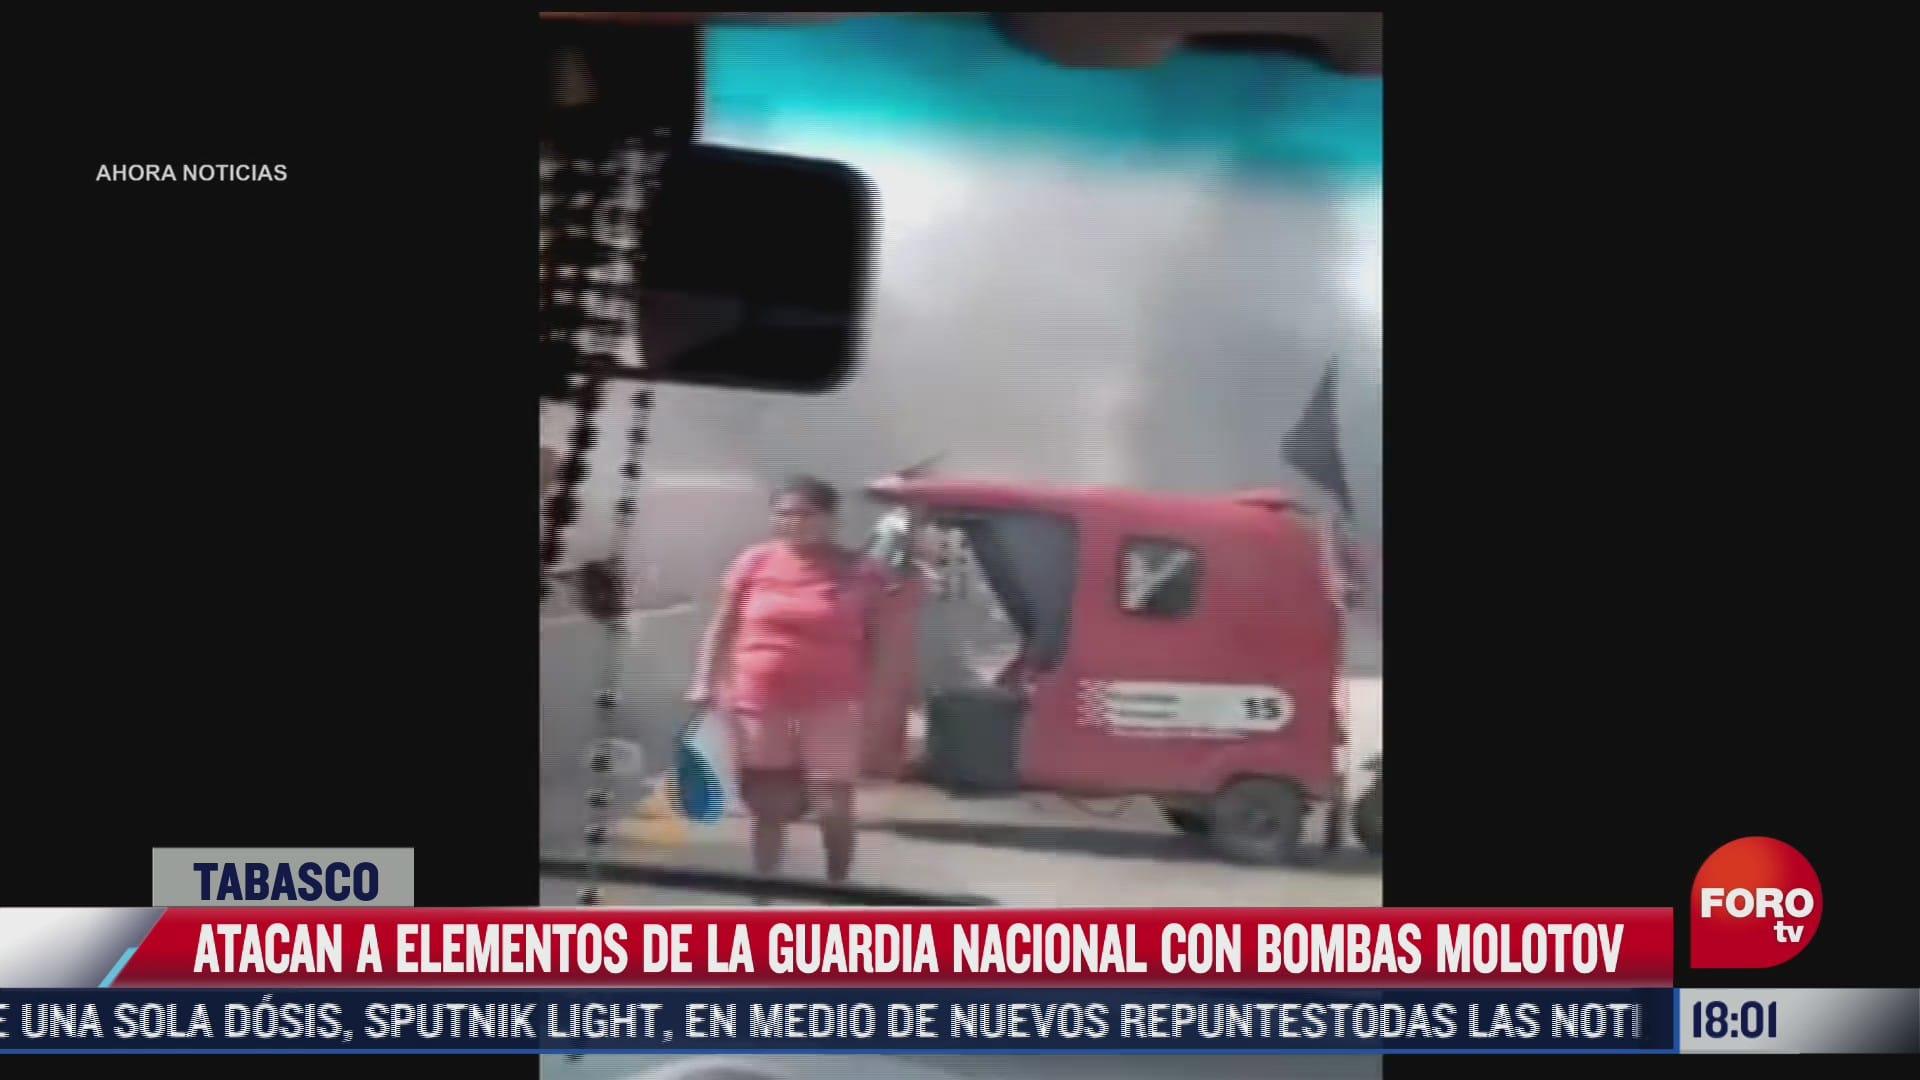 atacan a elementos de la guardia nacional con bombas molotov